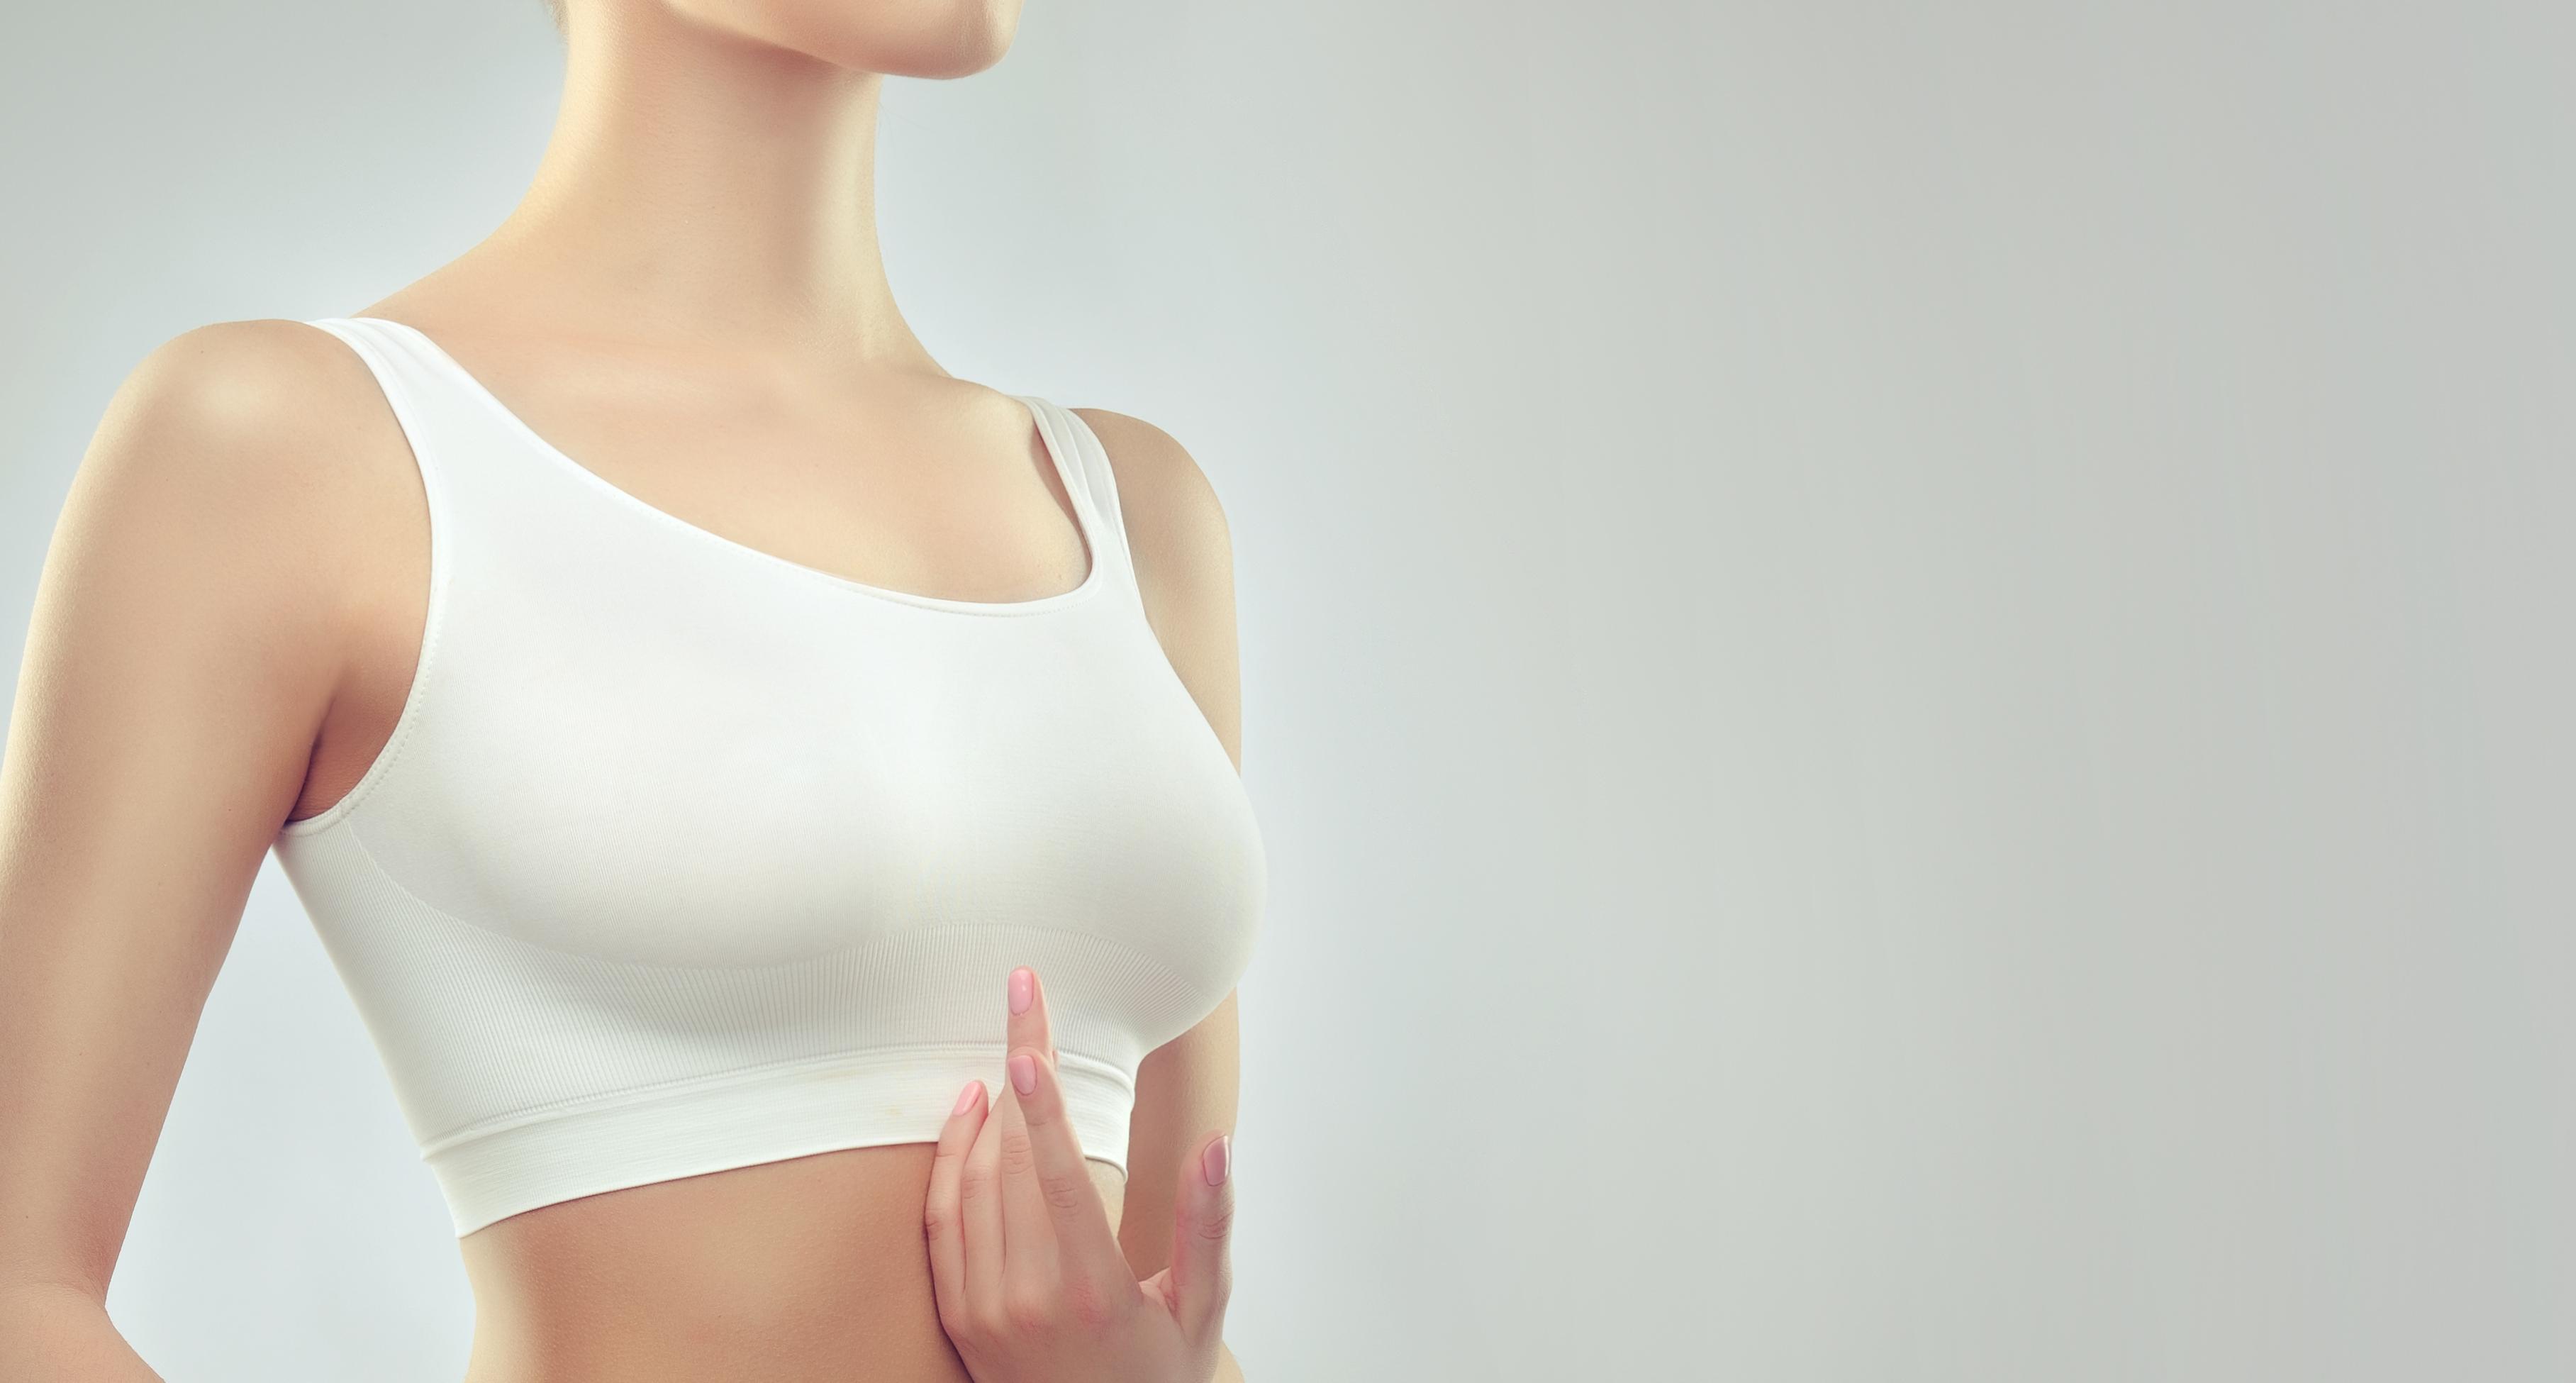 Breast Lift, Teknik Mengencangkan Payudara Tanpa Menggunakan Implan